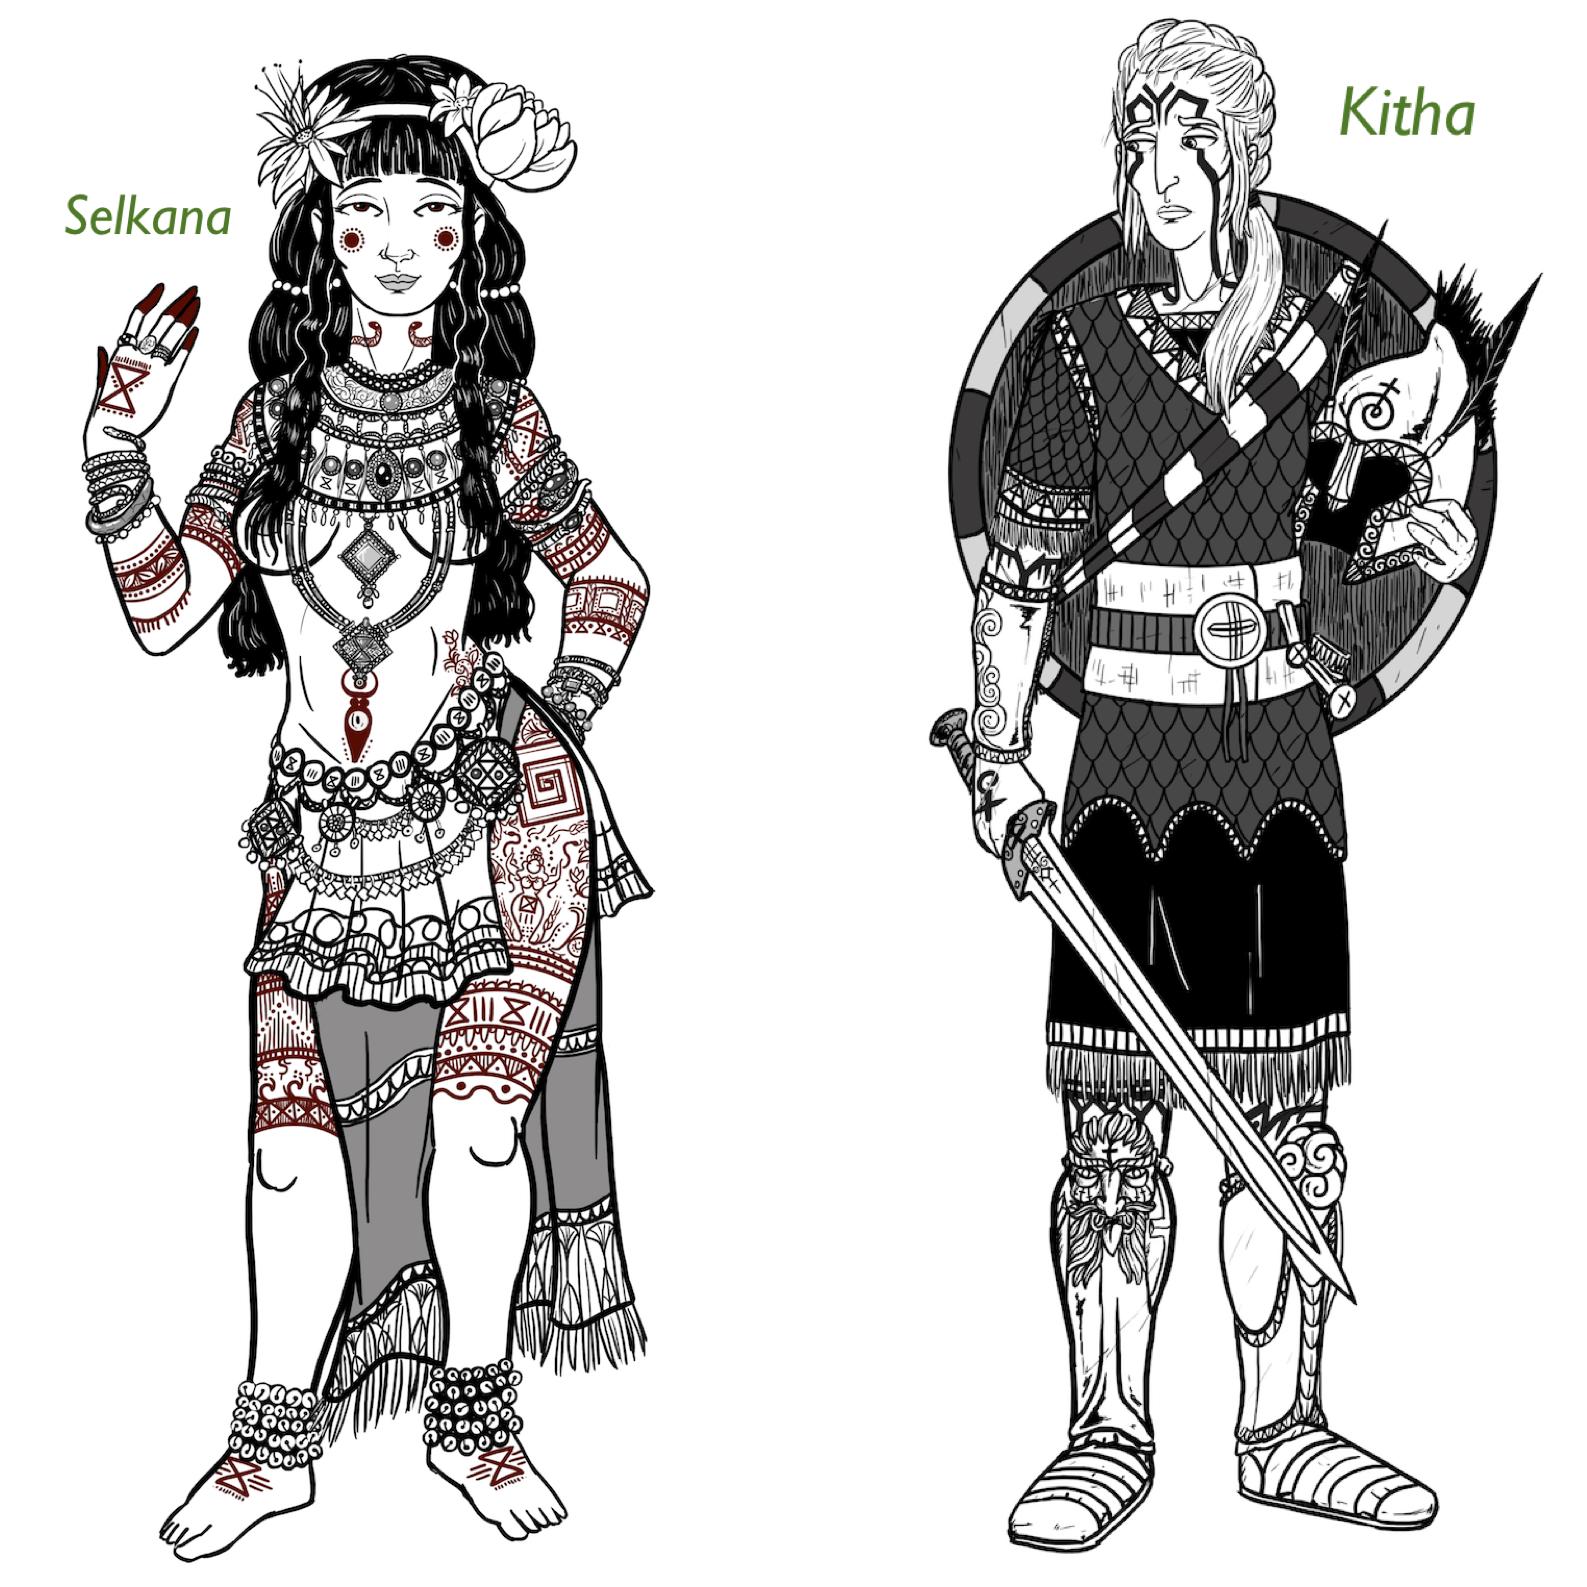 Selkana & Kitha by Kalin Kadiev